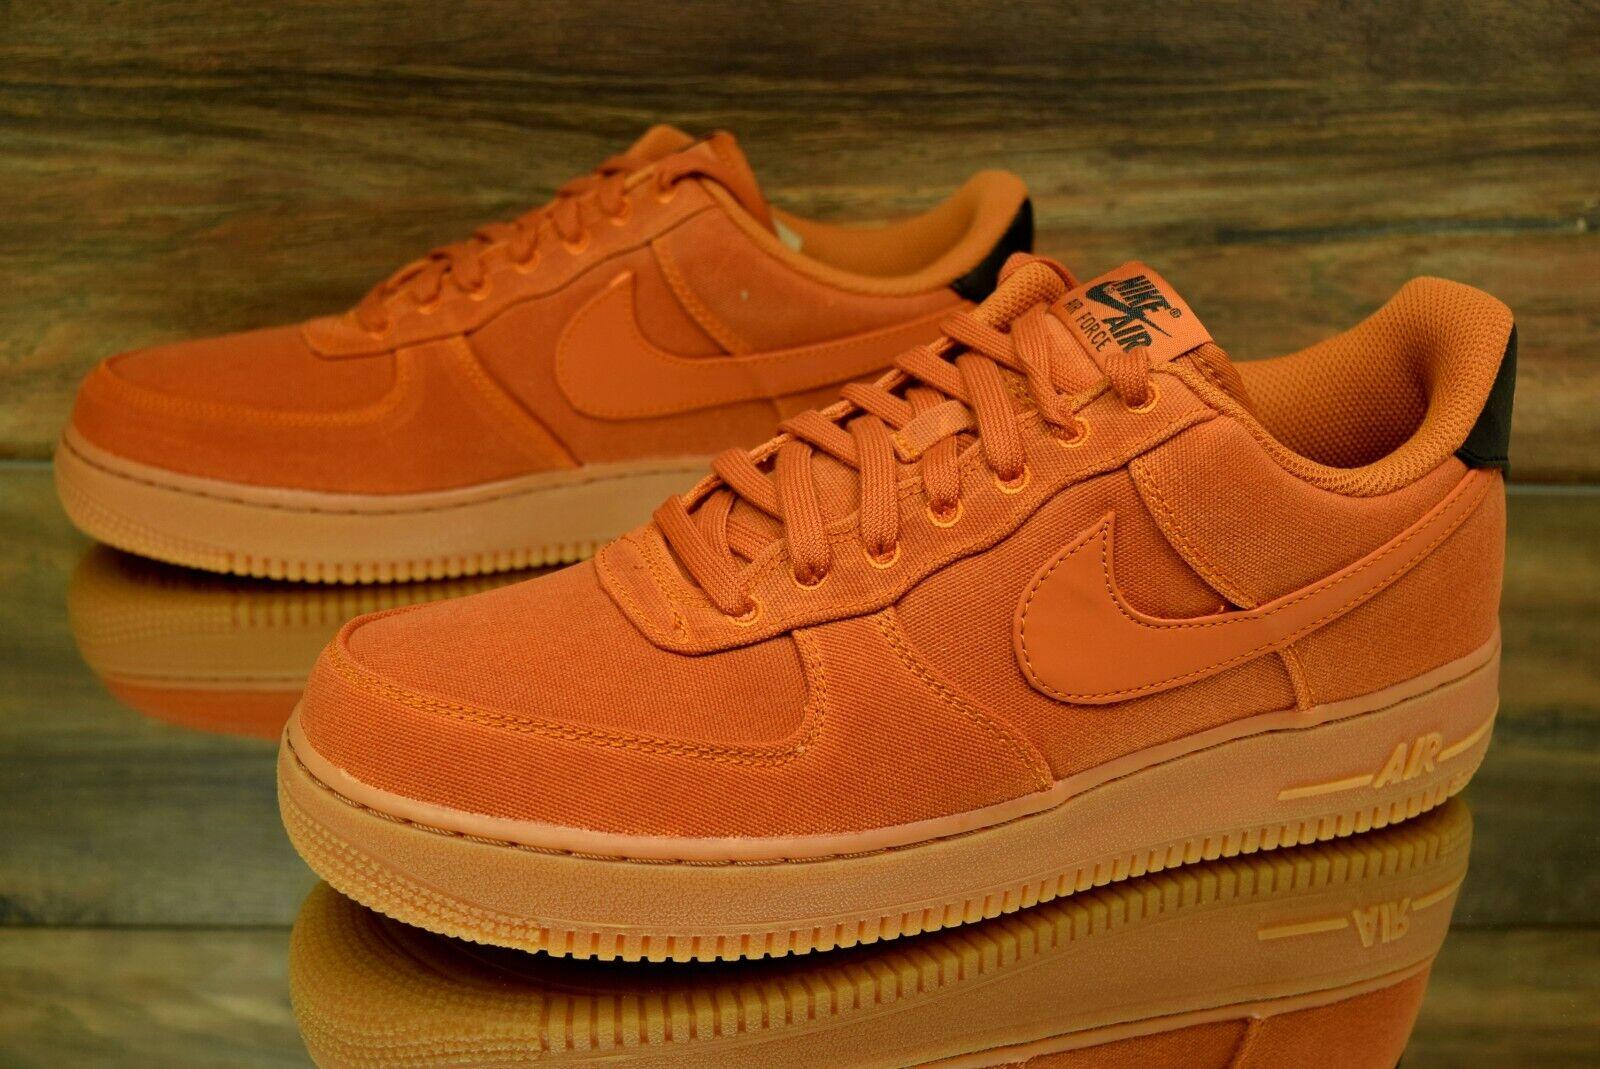 '07 Nike Lv8 Air Size Monarch Force 800 Men's Style Aq0117 New Multi 1 Shoes PikuXZ